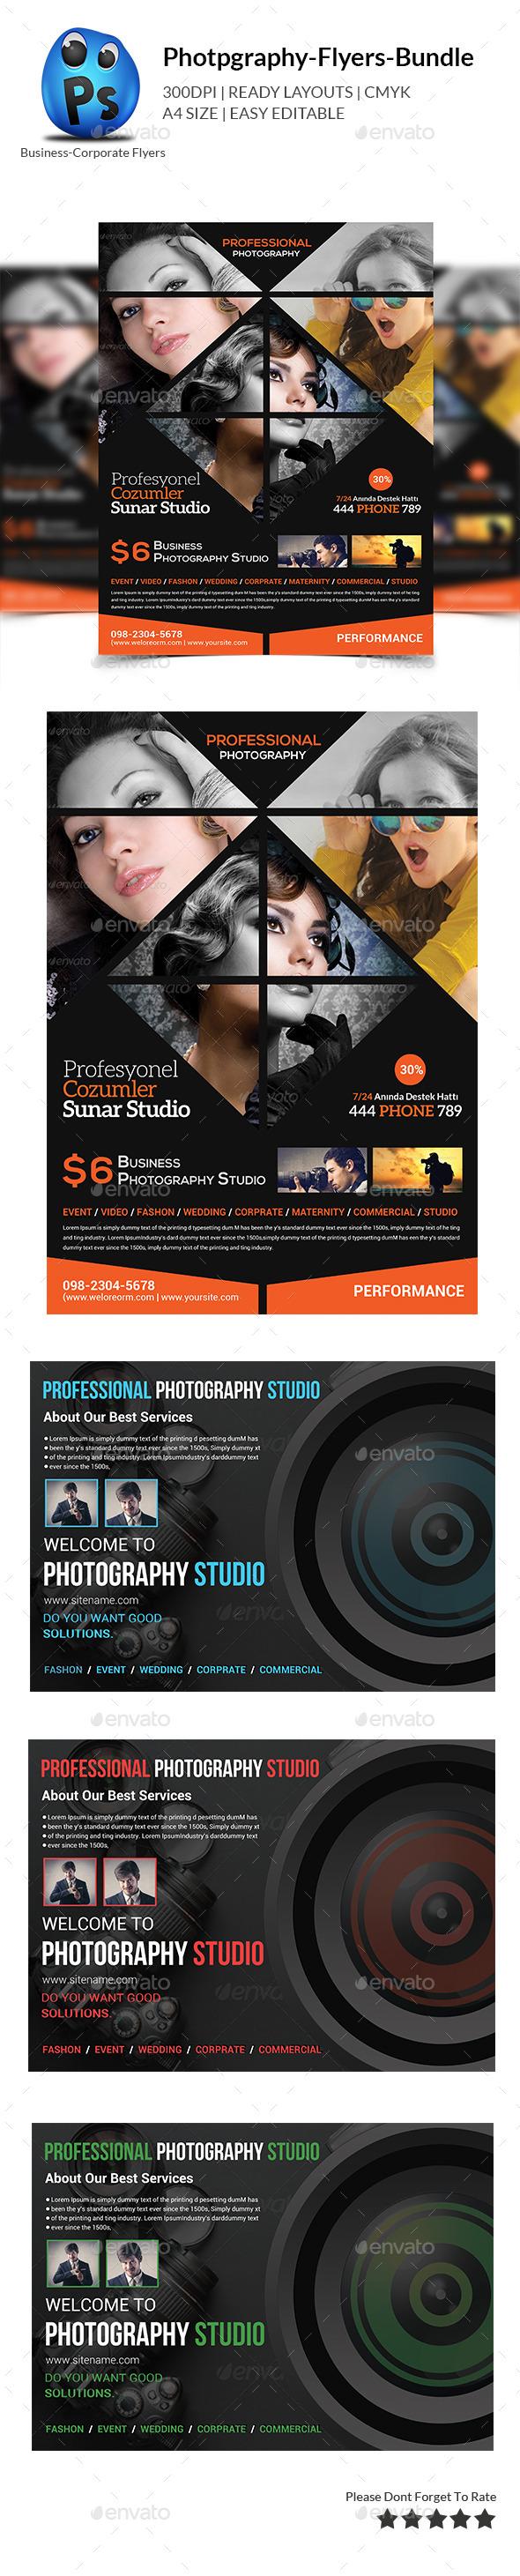 GraphicRiver Photography Flyer Bundle Print Templates 10519800